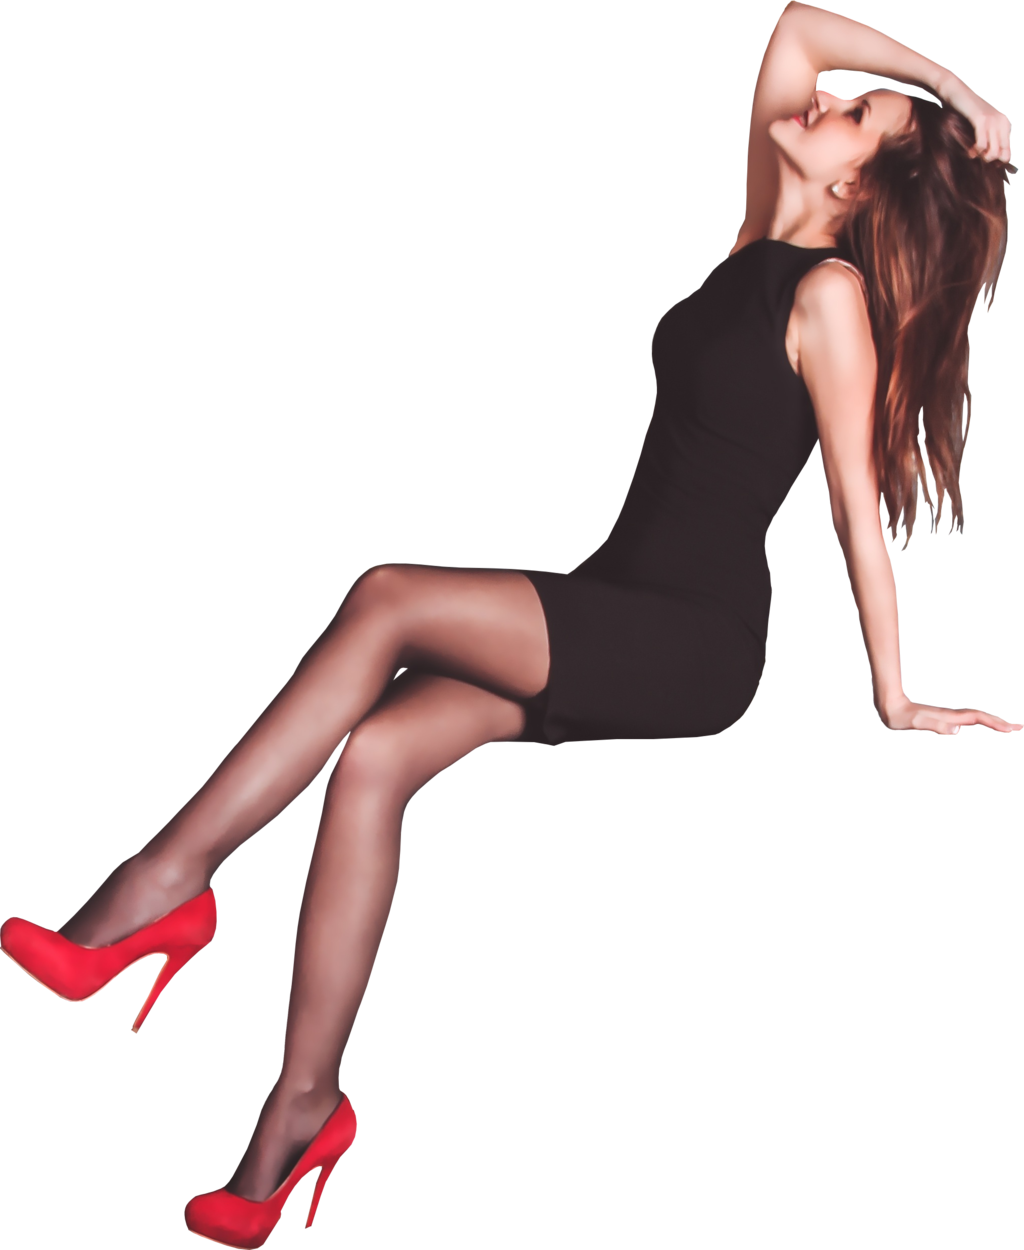 Woman girl PNG image